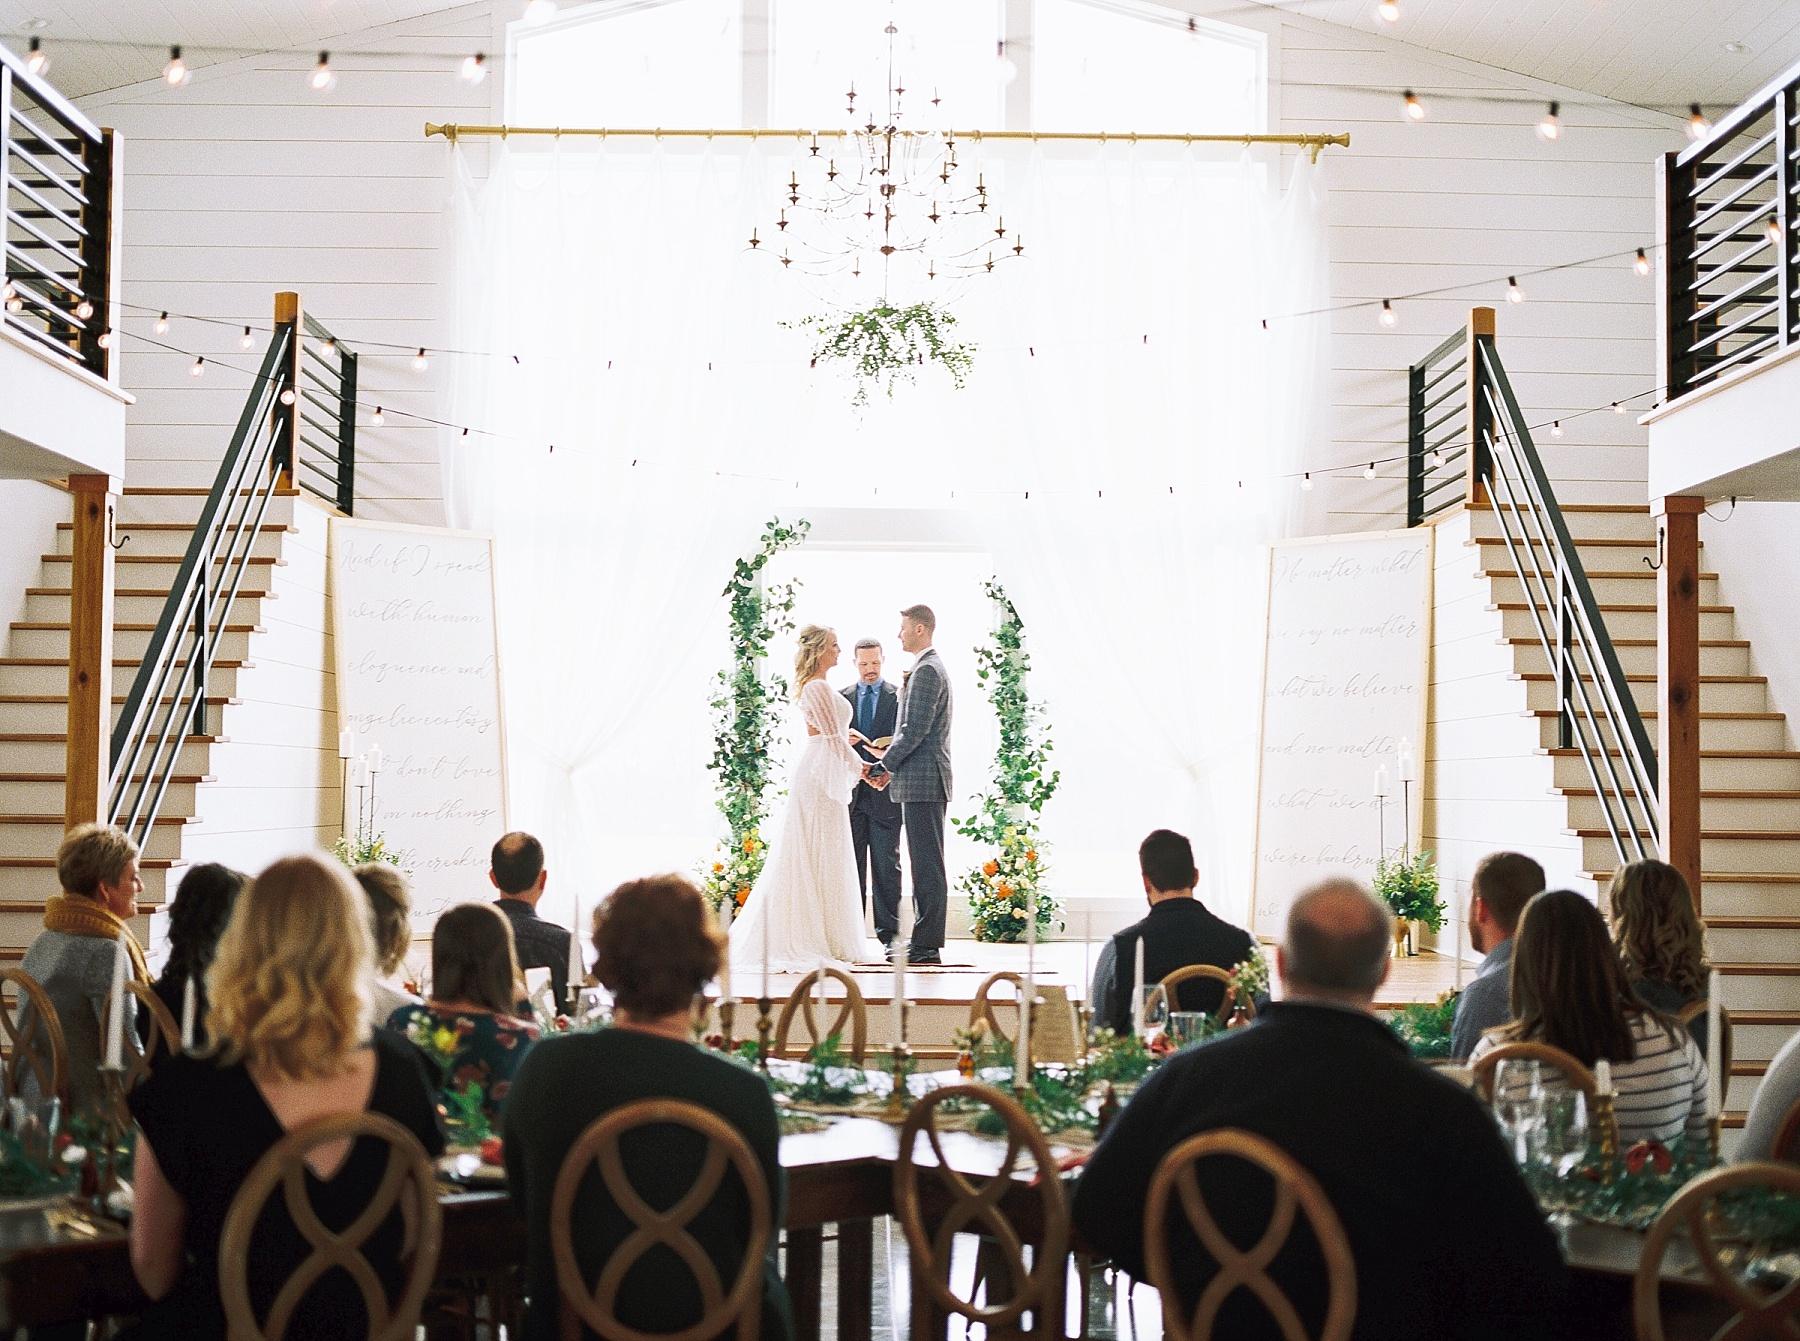 Eclectic Scandinavian Winter Wedding in All White Venue Emerson Fields by Kelsi Kliethermes Photography Best Missouri and Maui Wedding Photographer_0013.jpg